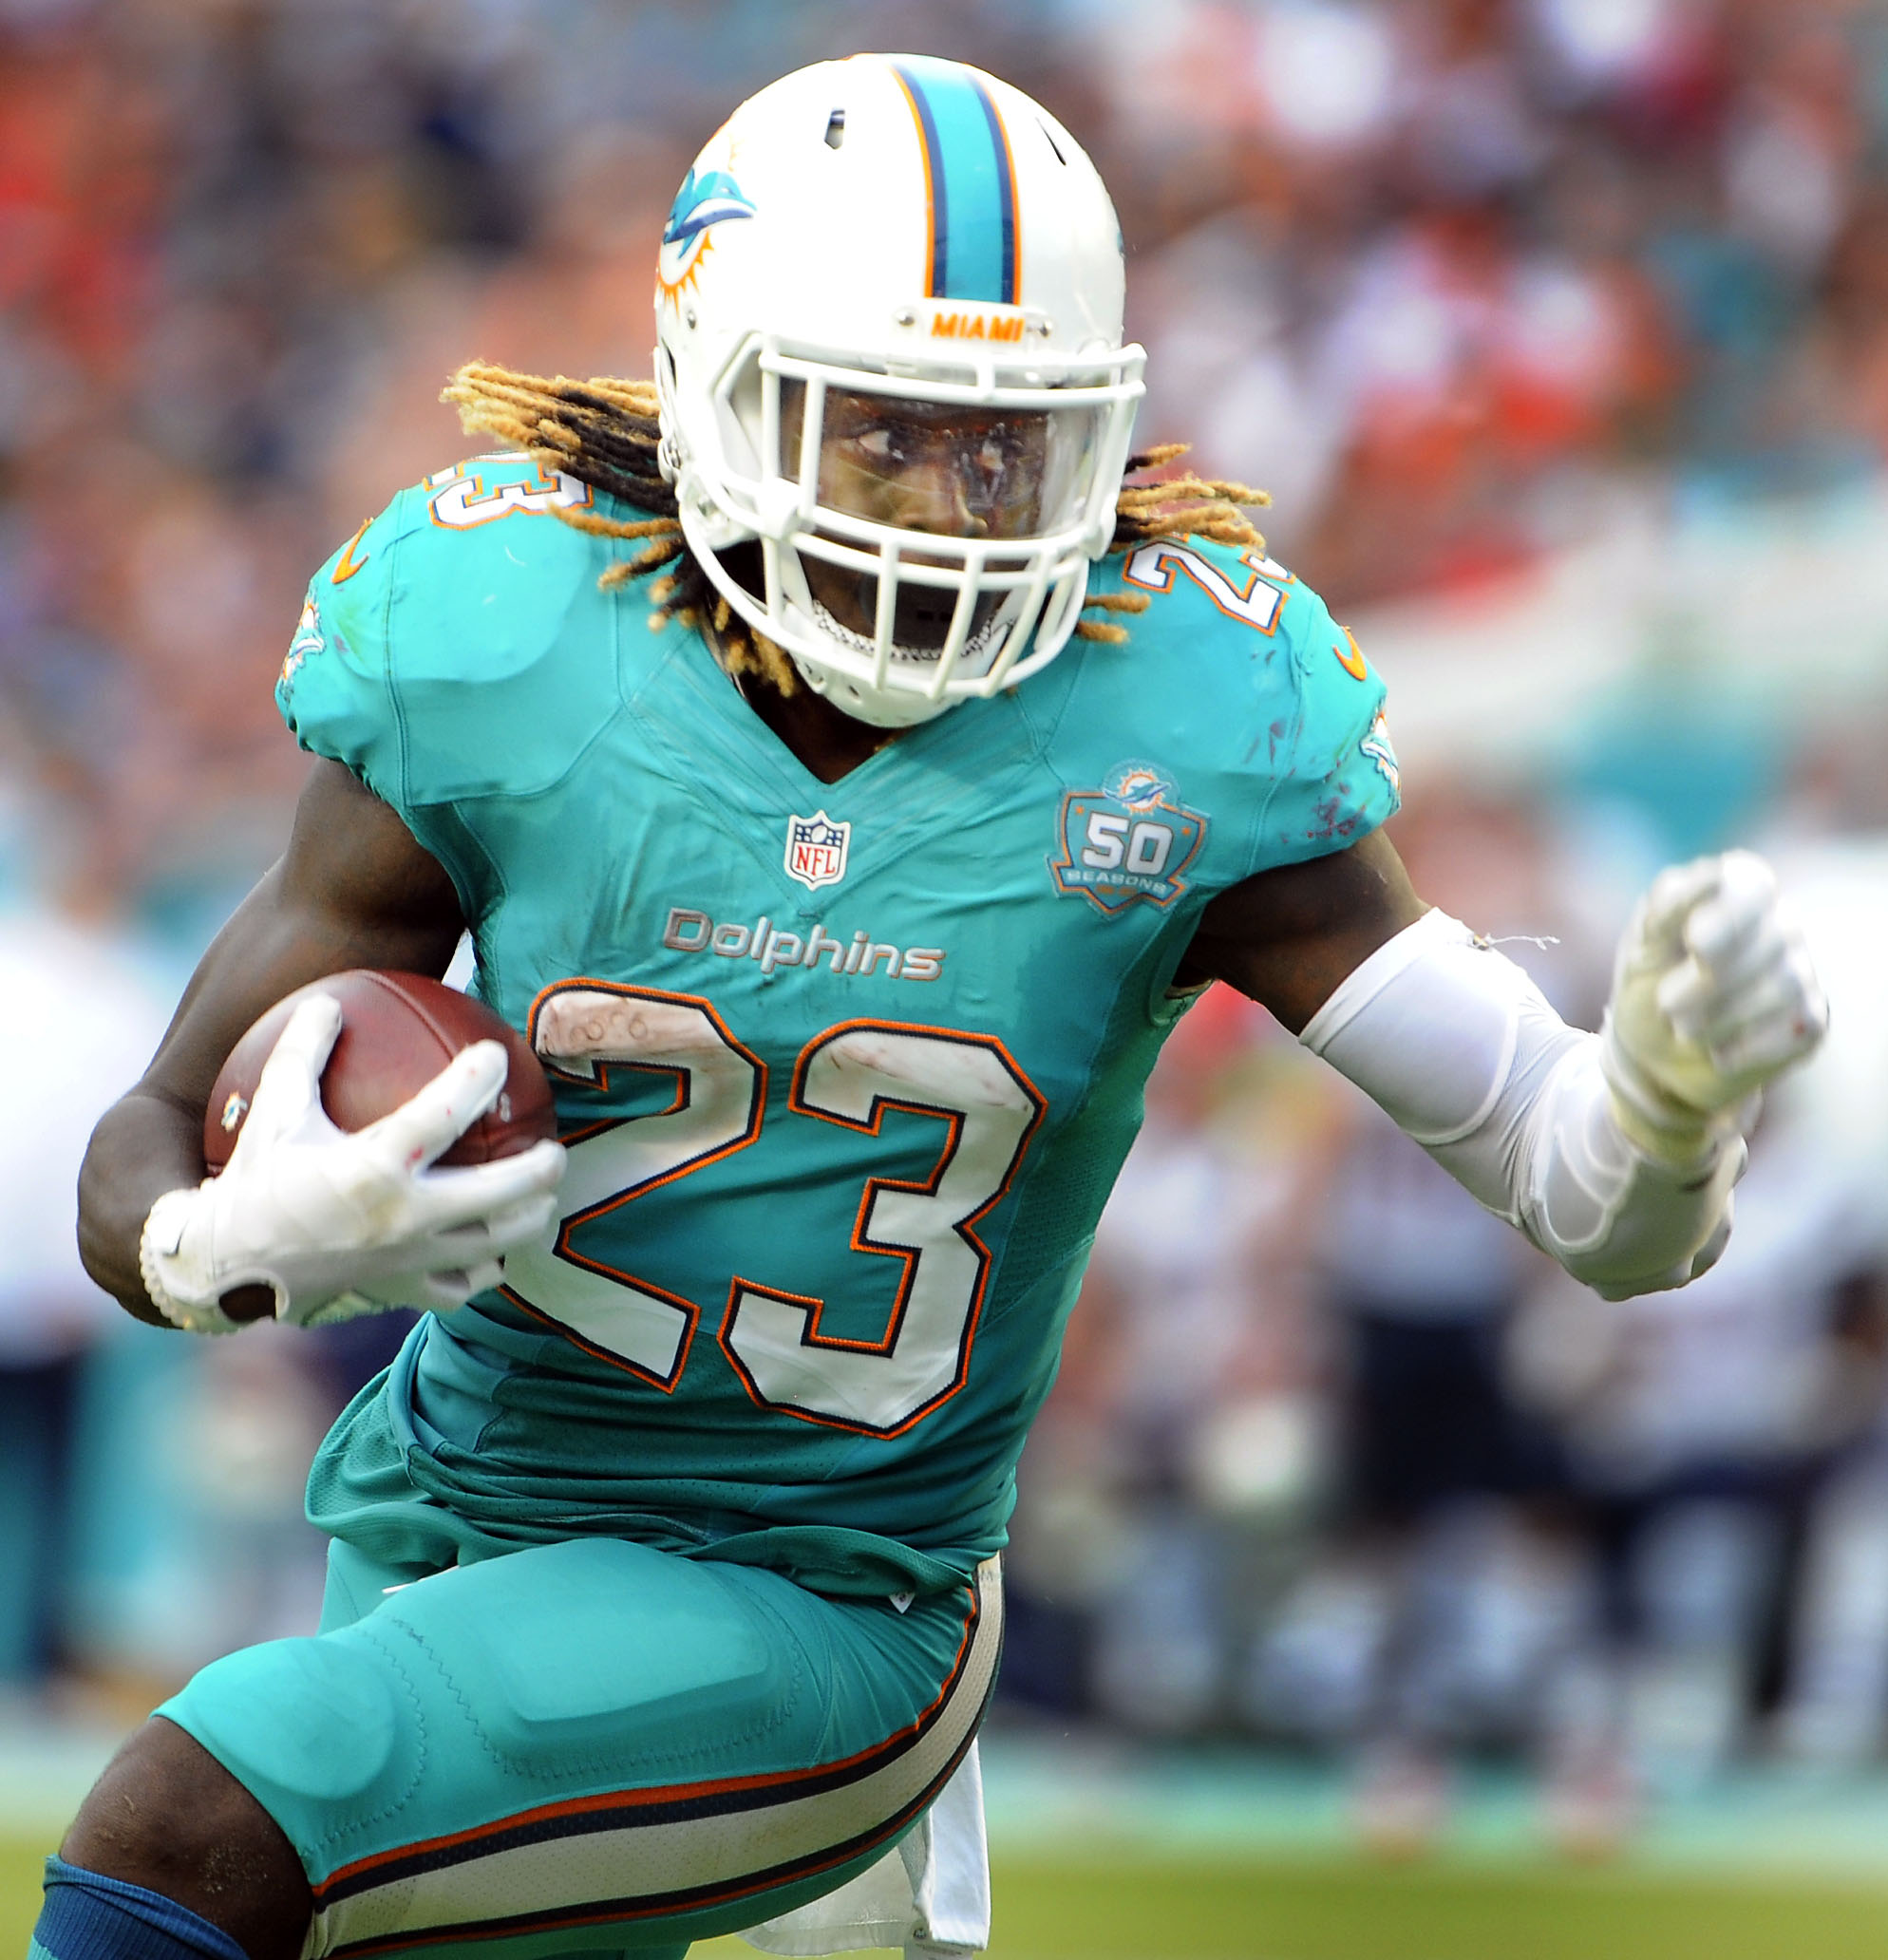 Dolphins Trade Jay Ajayi To Eagles